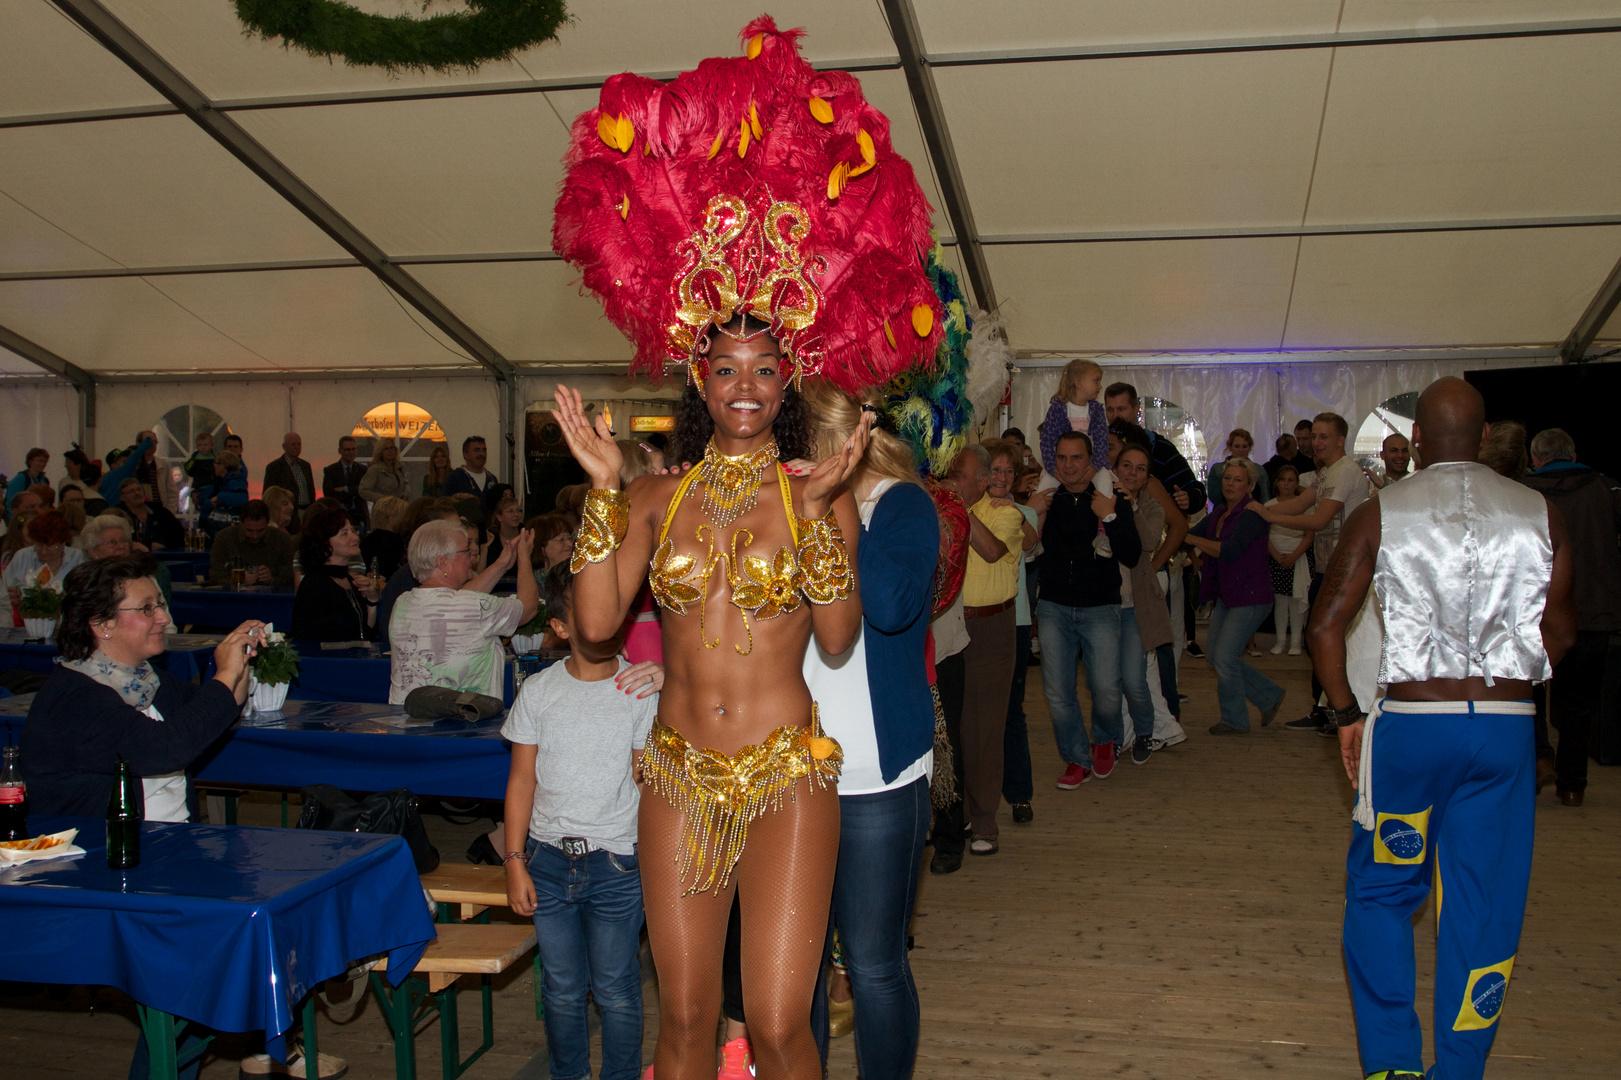 Copacabana-Sambashow Nr. 4651